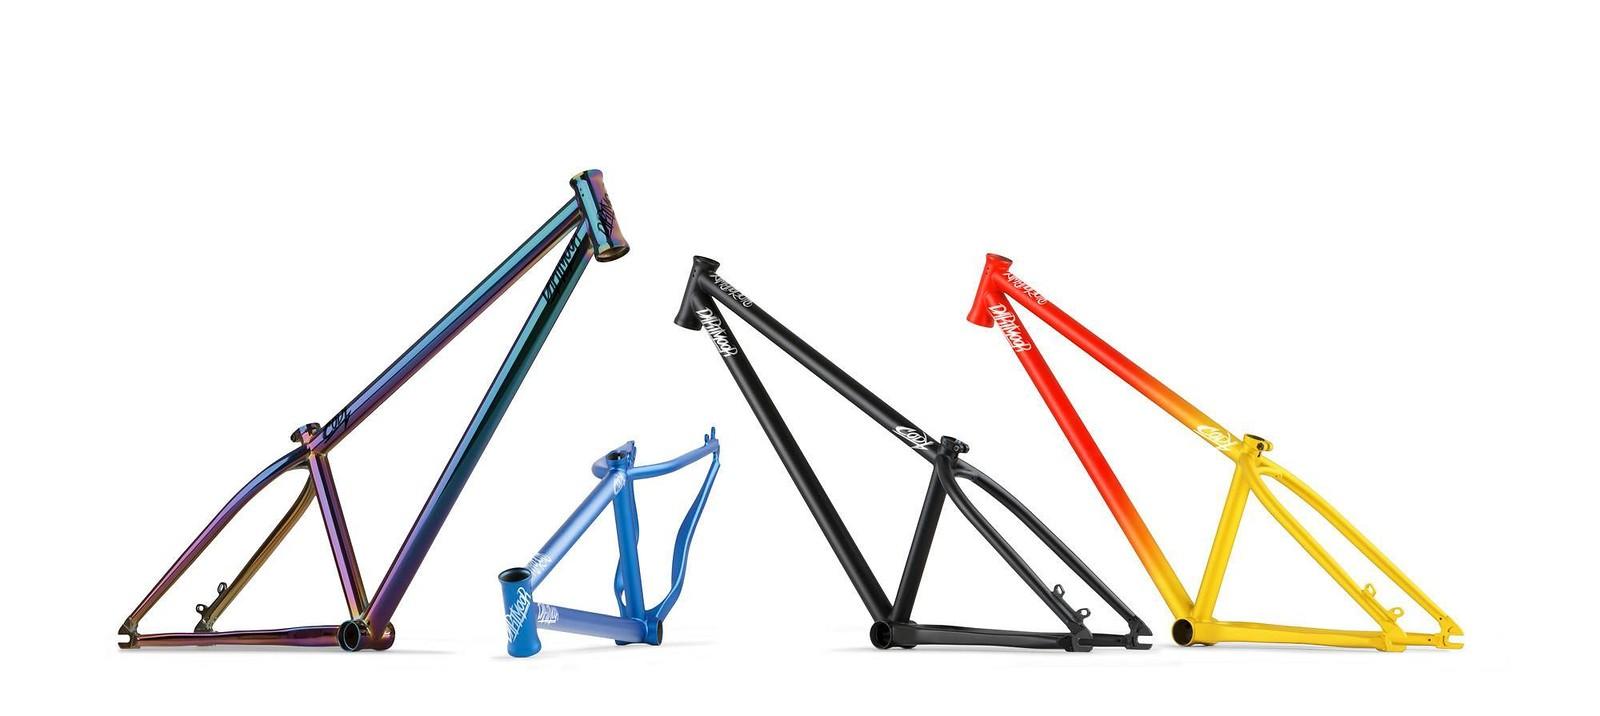 Cody 2014 with new graphics - Dartmoor Bikes - Mountain Biking Pictures - Vital MTB